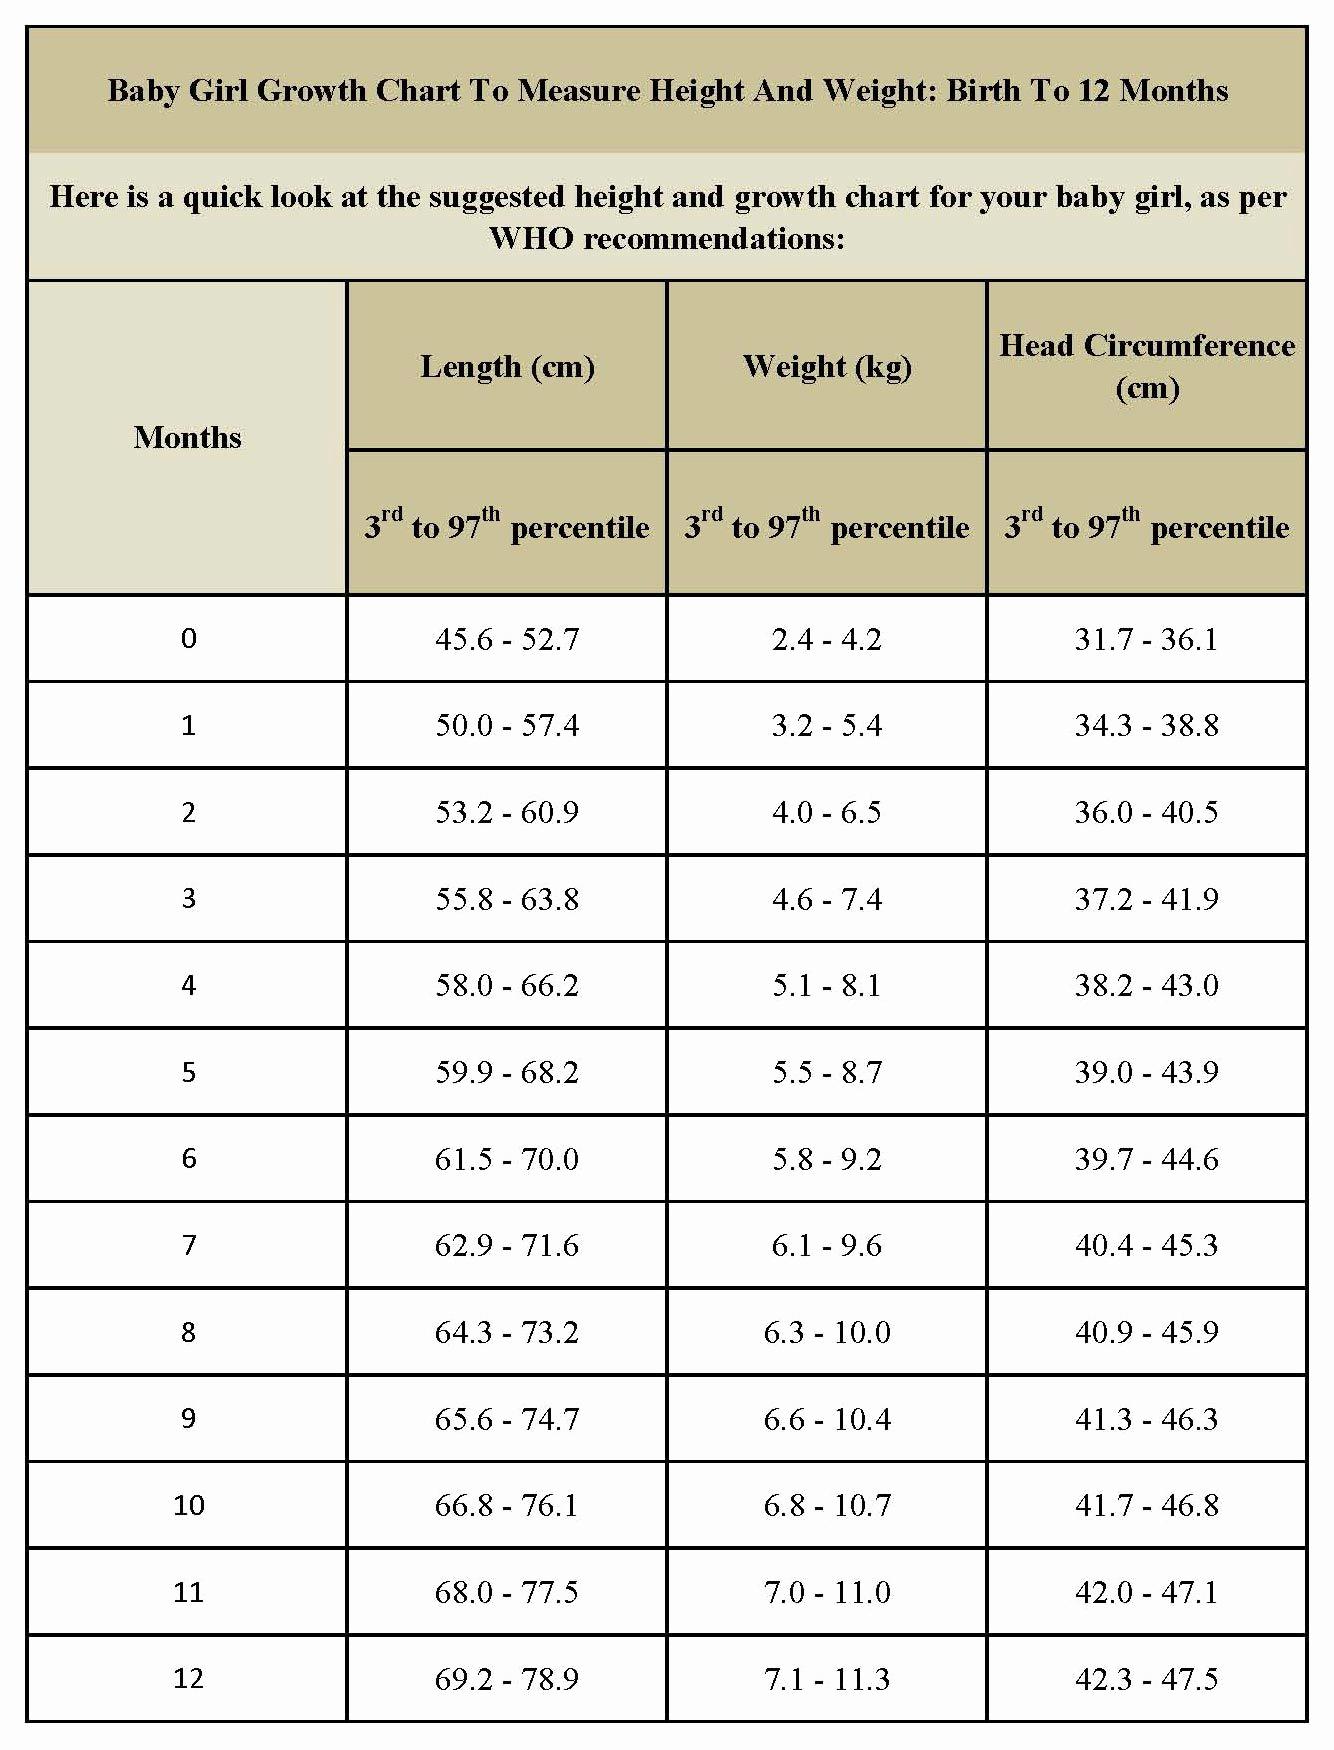 Baby Girl Weight Chart Beautiful Standard Height and Weight Chart for Baby Girls